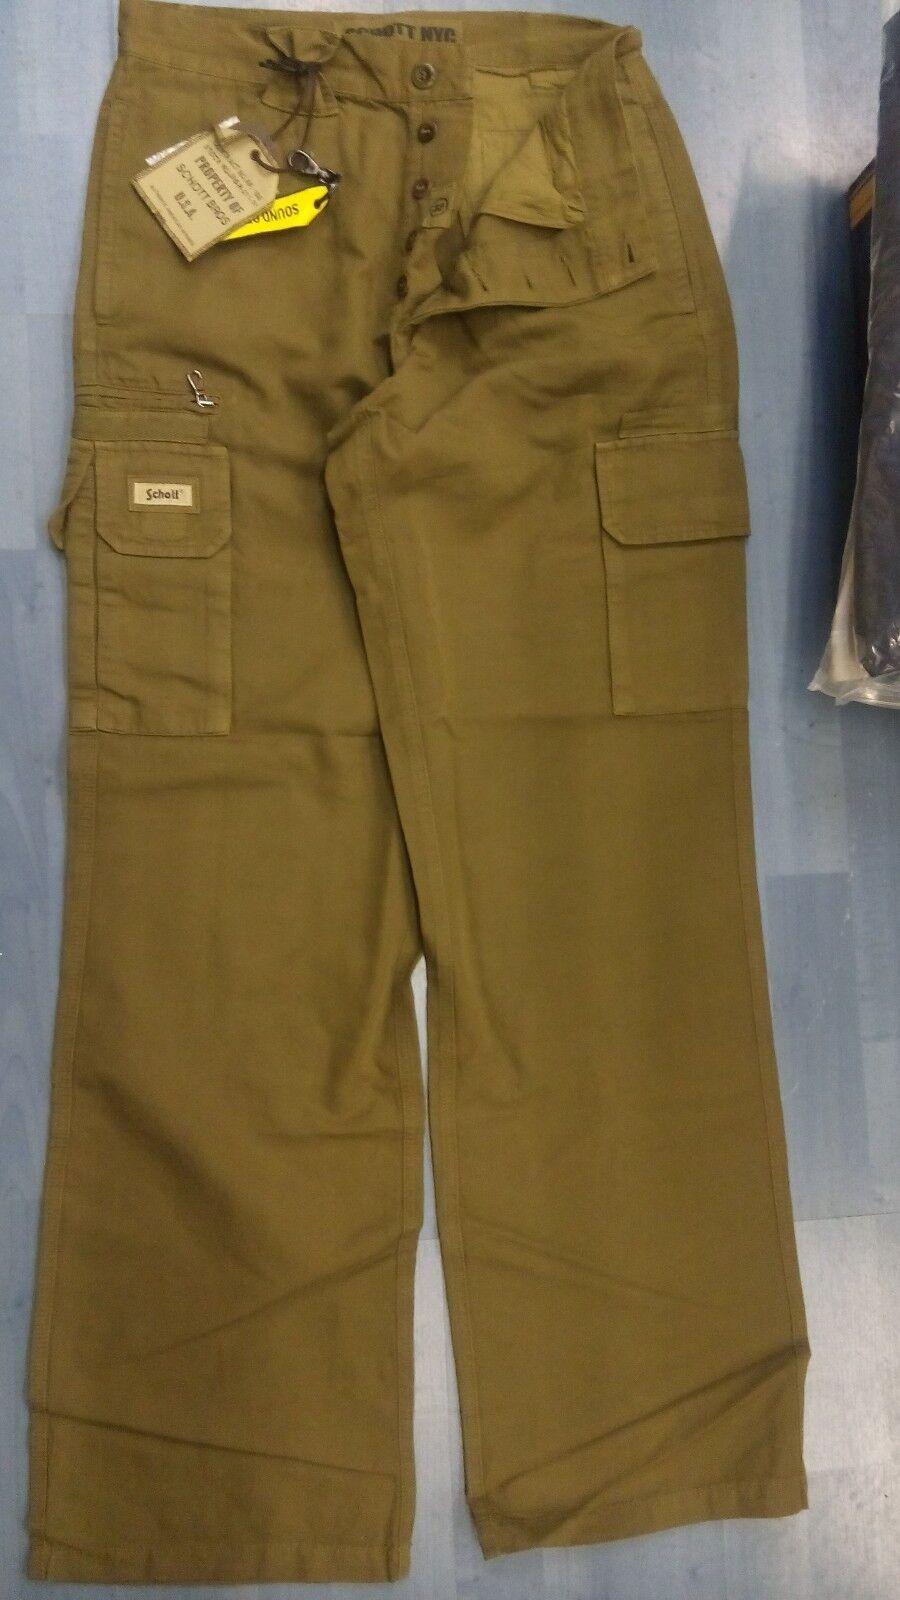 Pantalone 36 SCHOTT tasconi cotone tg disp. 32 33 34 36 Pantalone ba9270